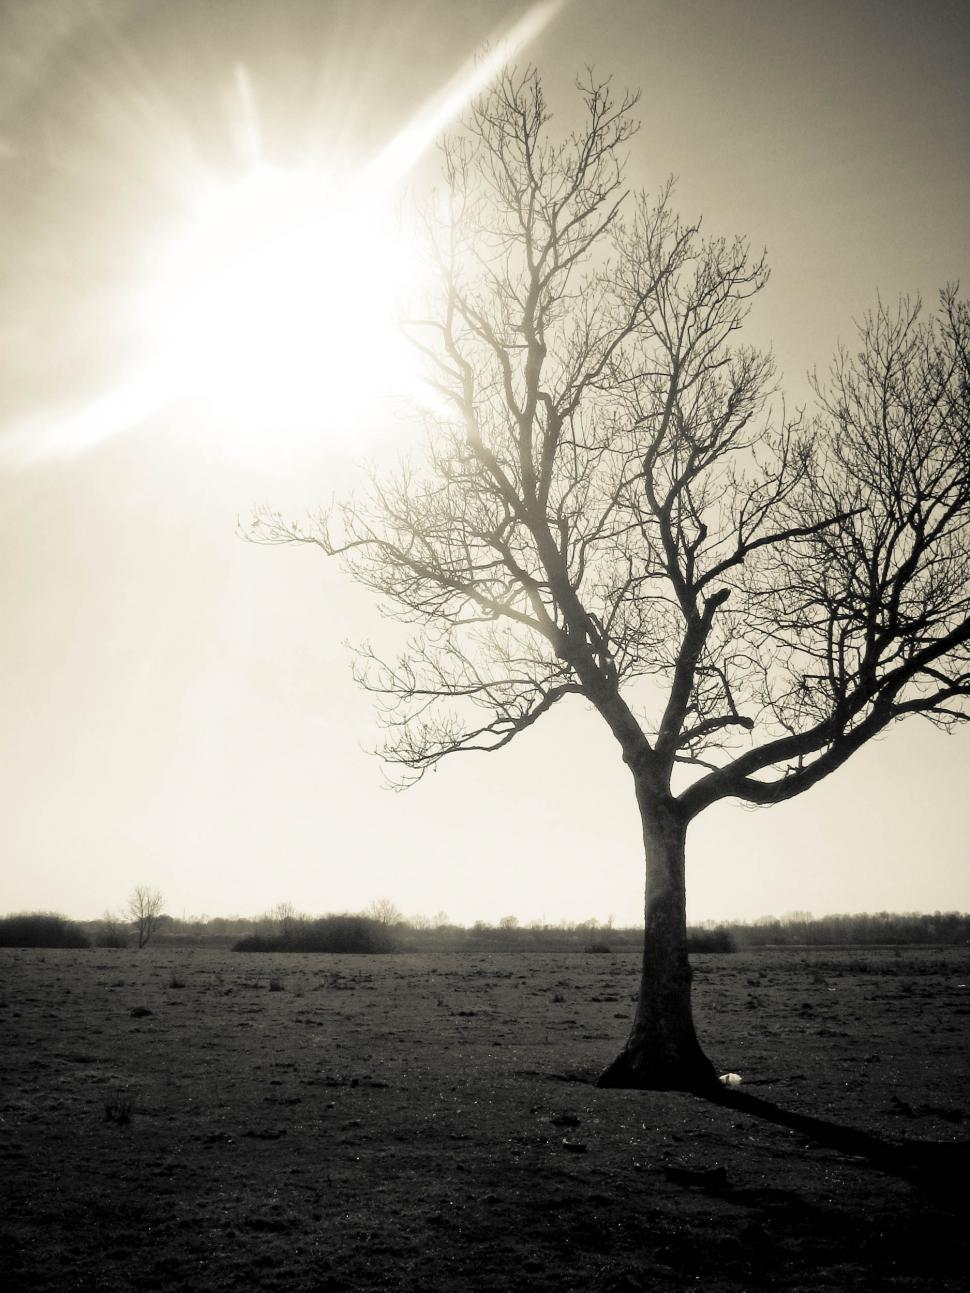 Download Free Stock Photo of Sun glare and single tree